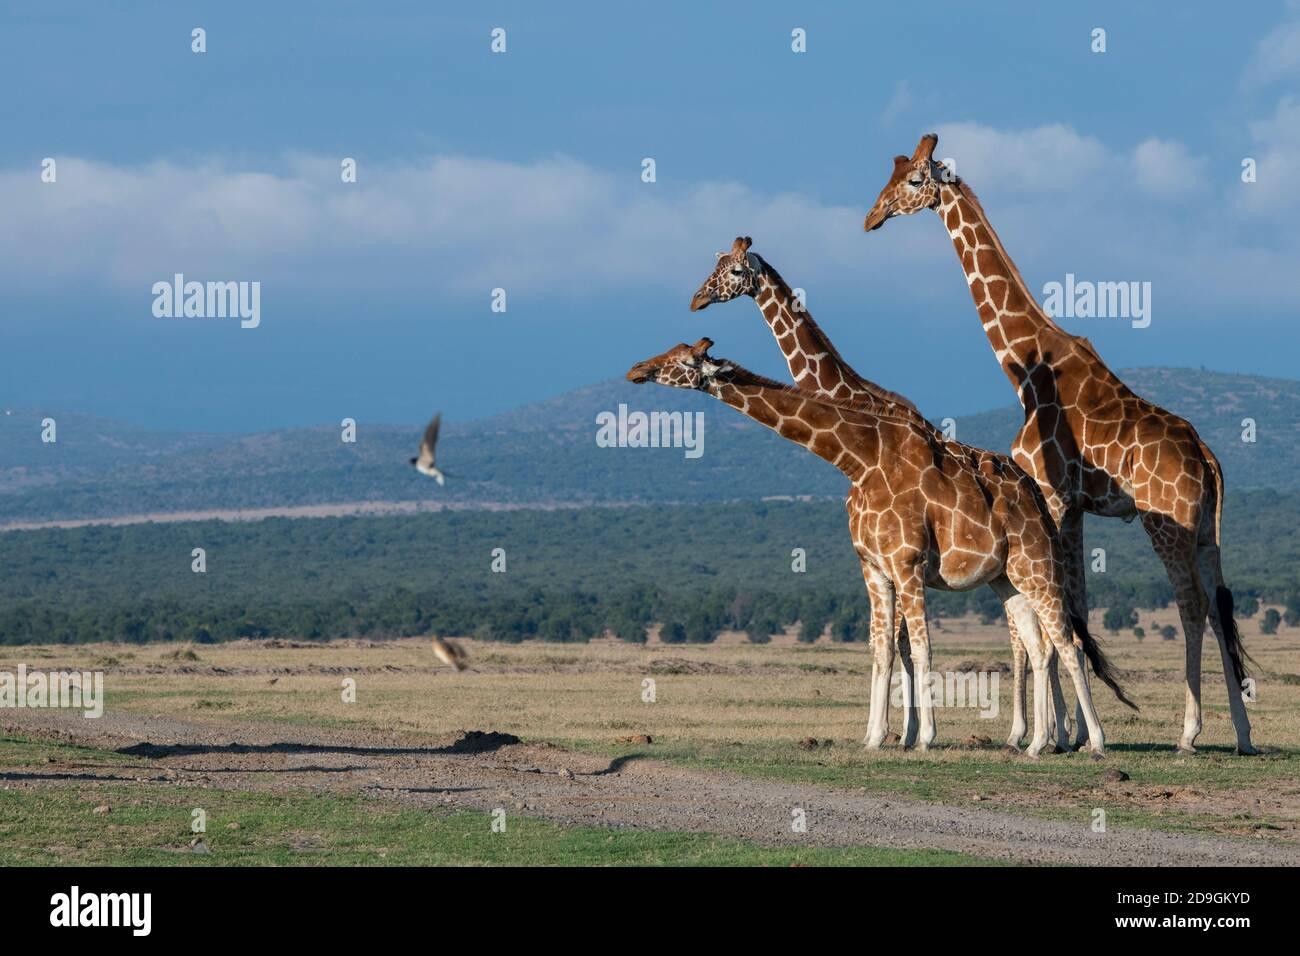 Afrika, Kenia, Laikipia Plateau, Northern Frontier District, Ol Pejeta Conservancy. Netzgiraffen (WILD: Giraffa camelopardalis reticulata) Stockfoto